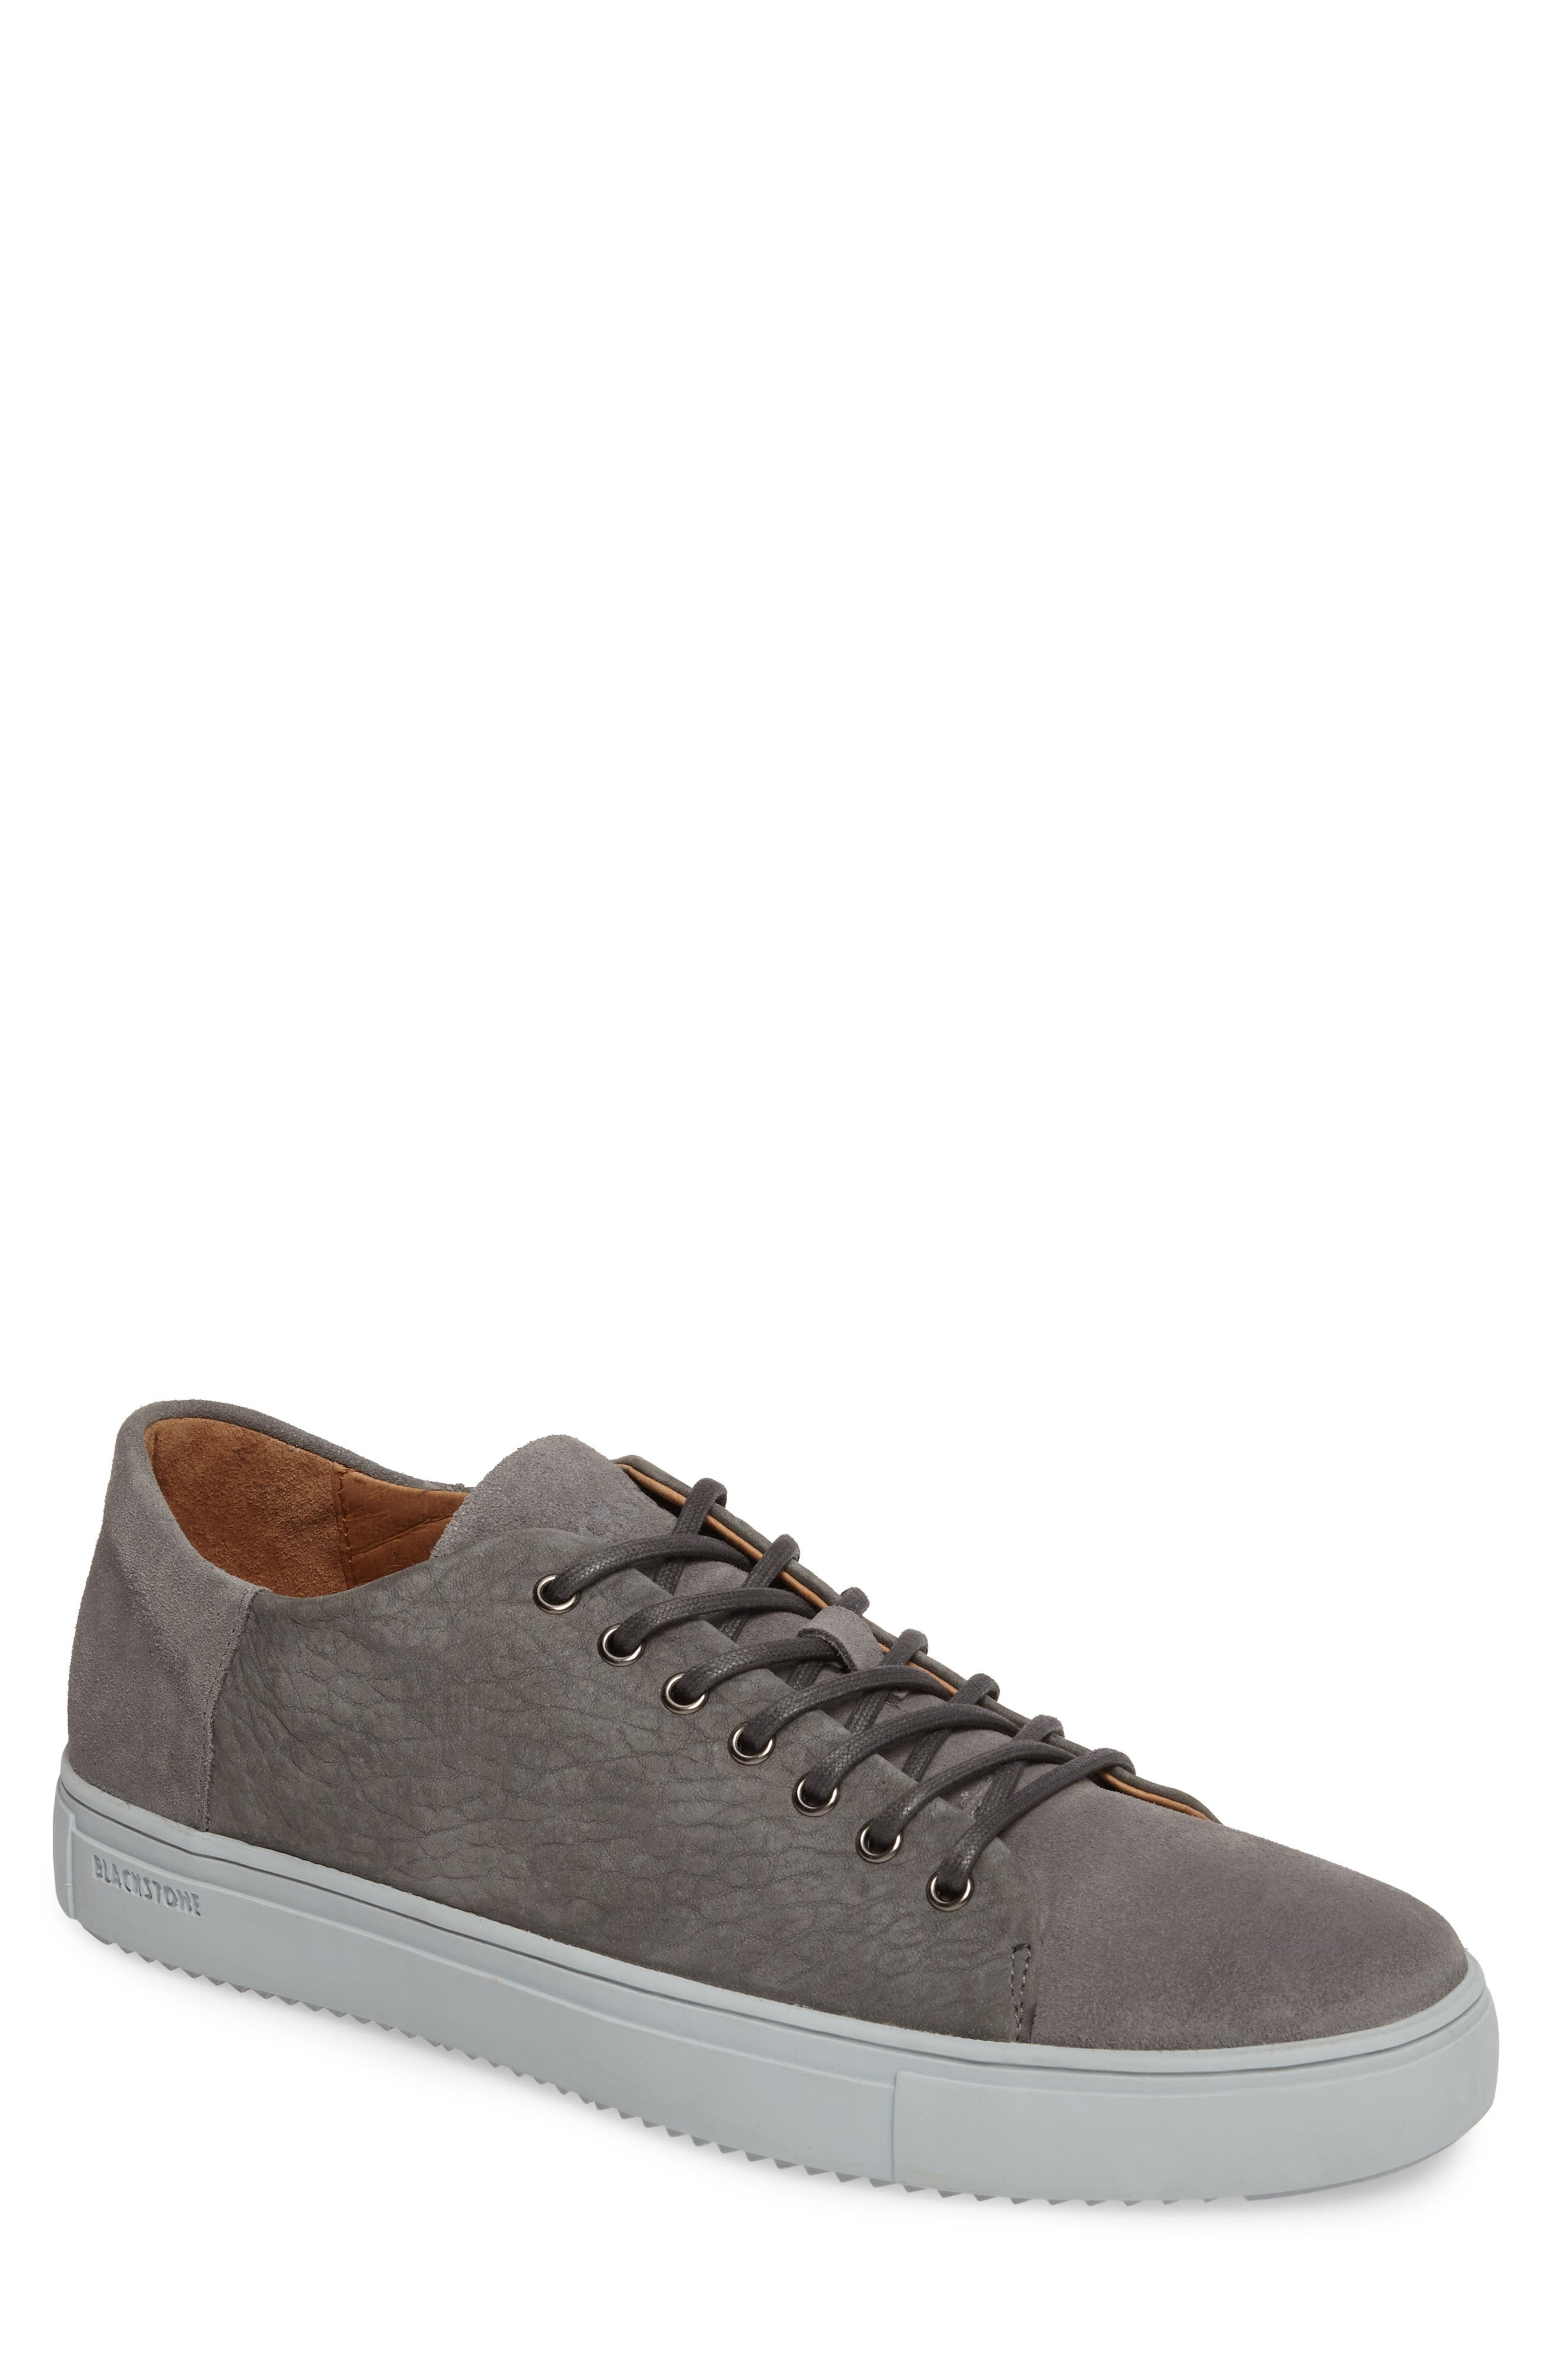 Blackstone OM 58 Sneaker (Men)